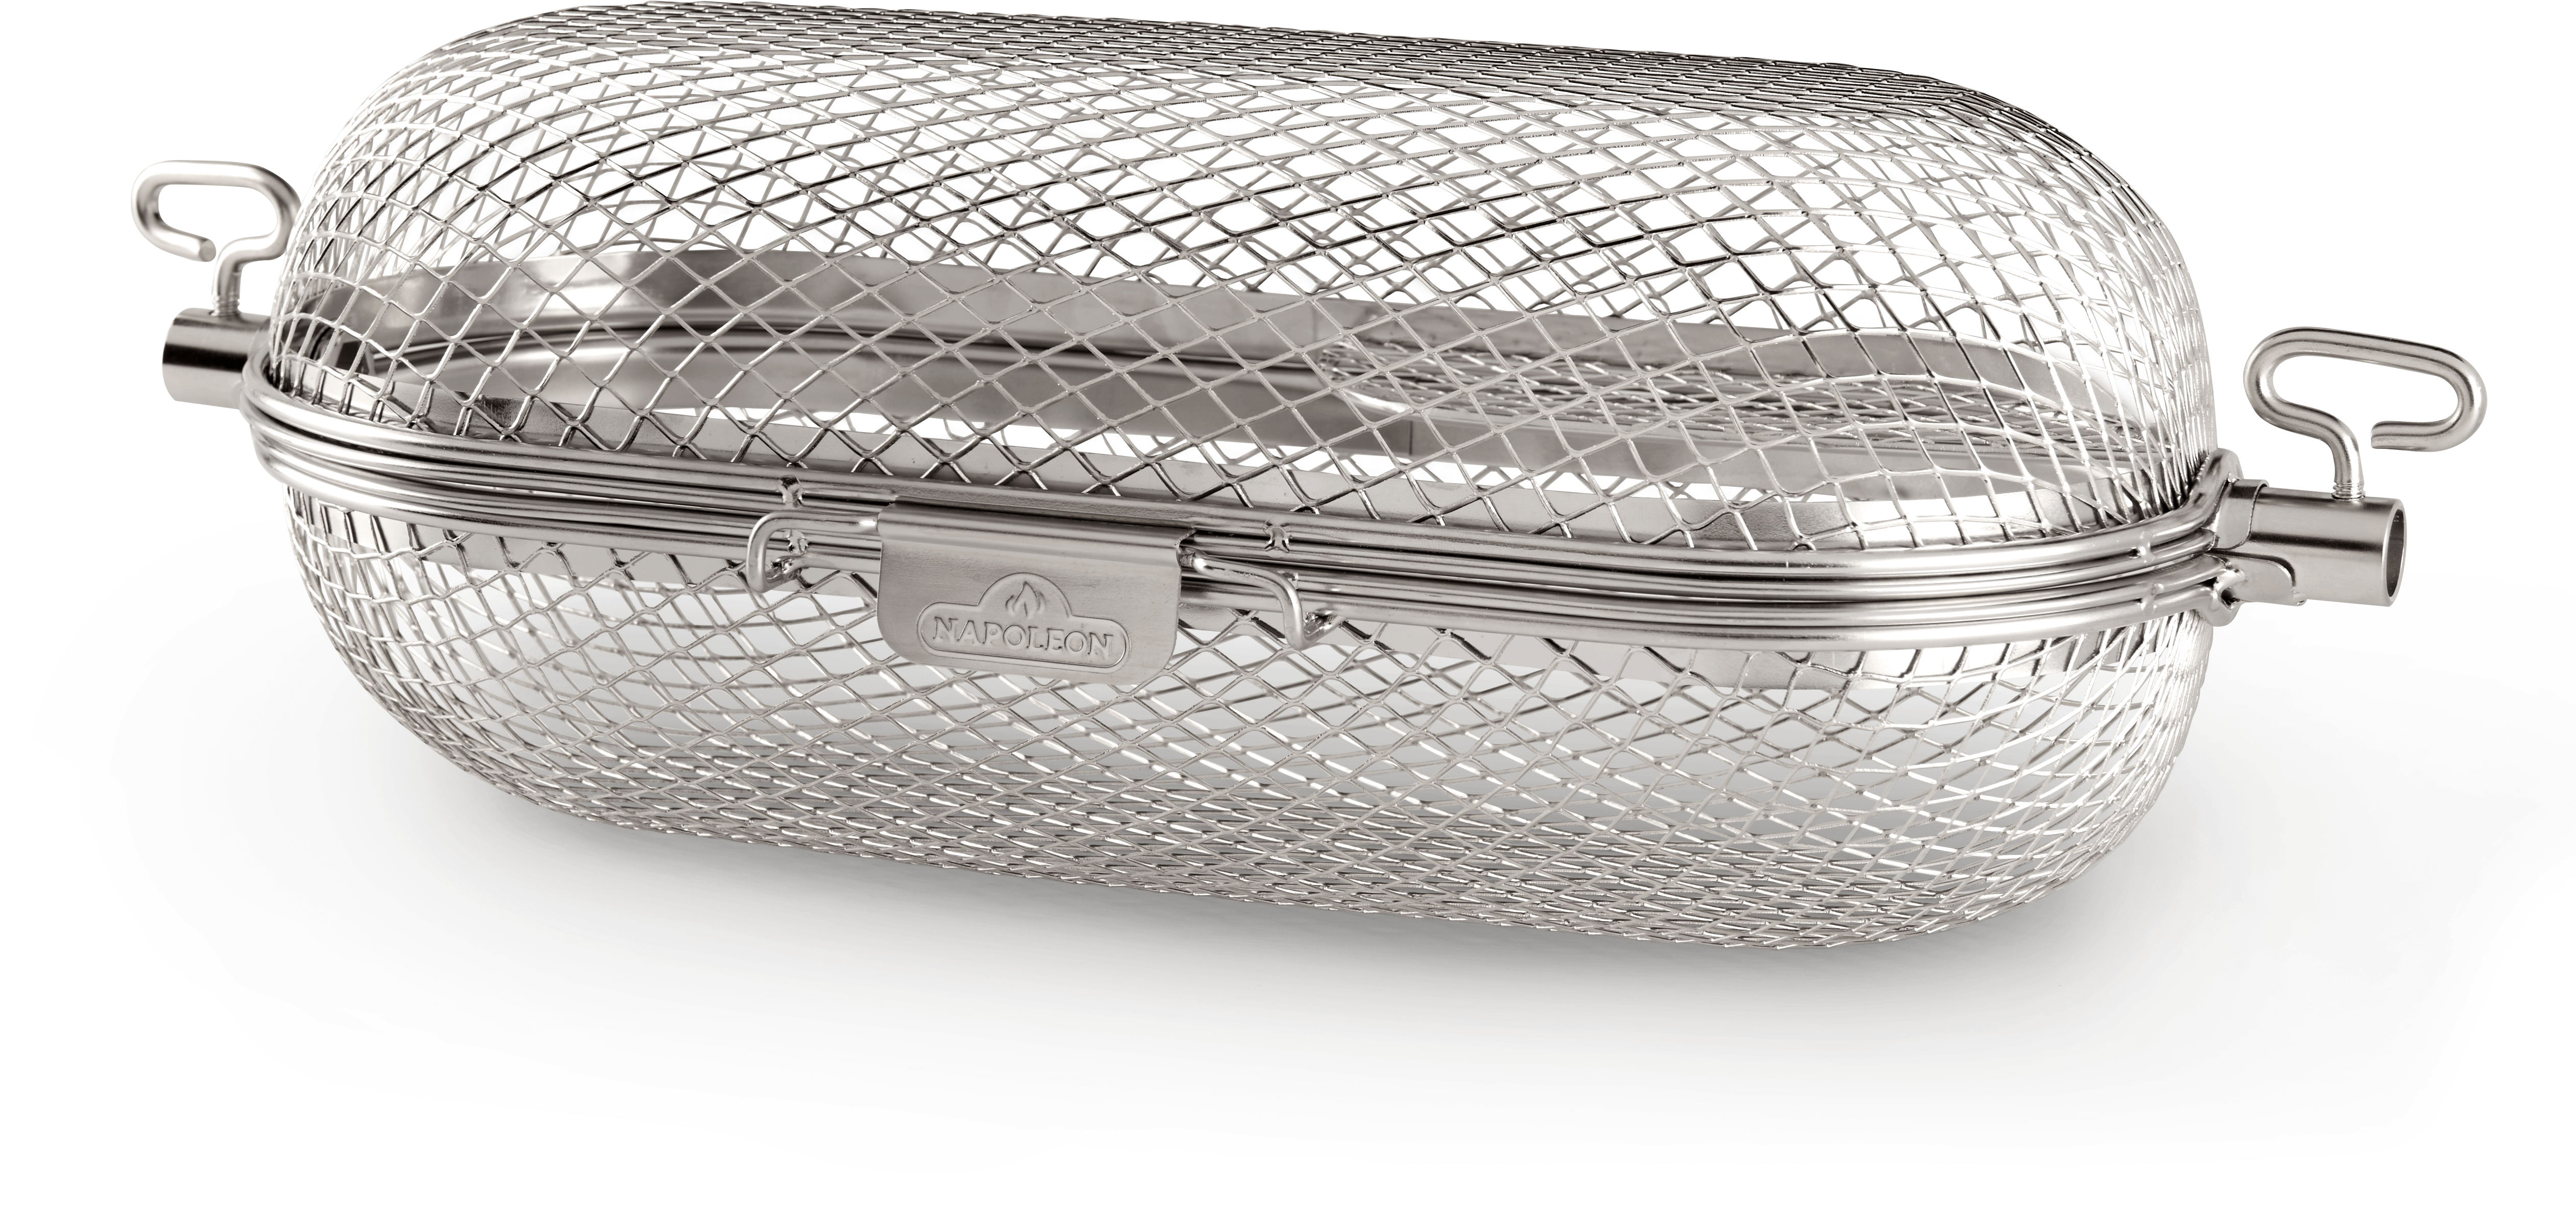 Napoleon Rotisserie Grill Basket